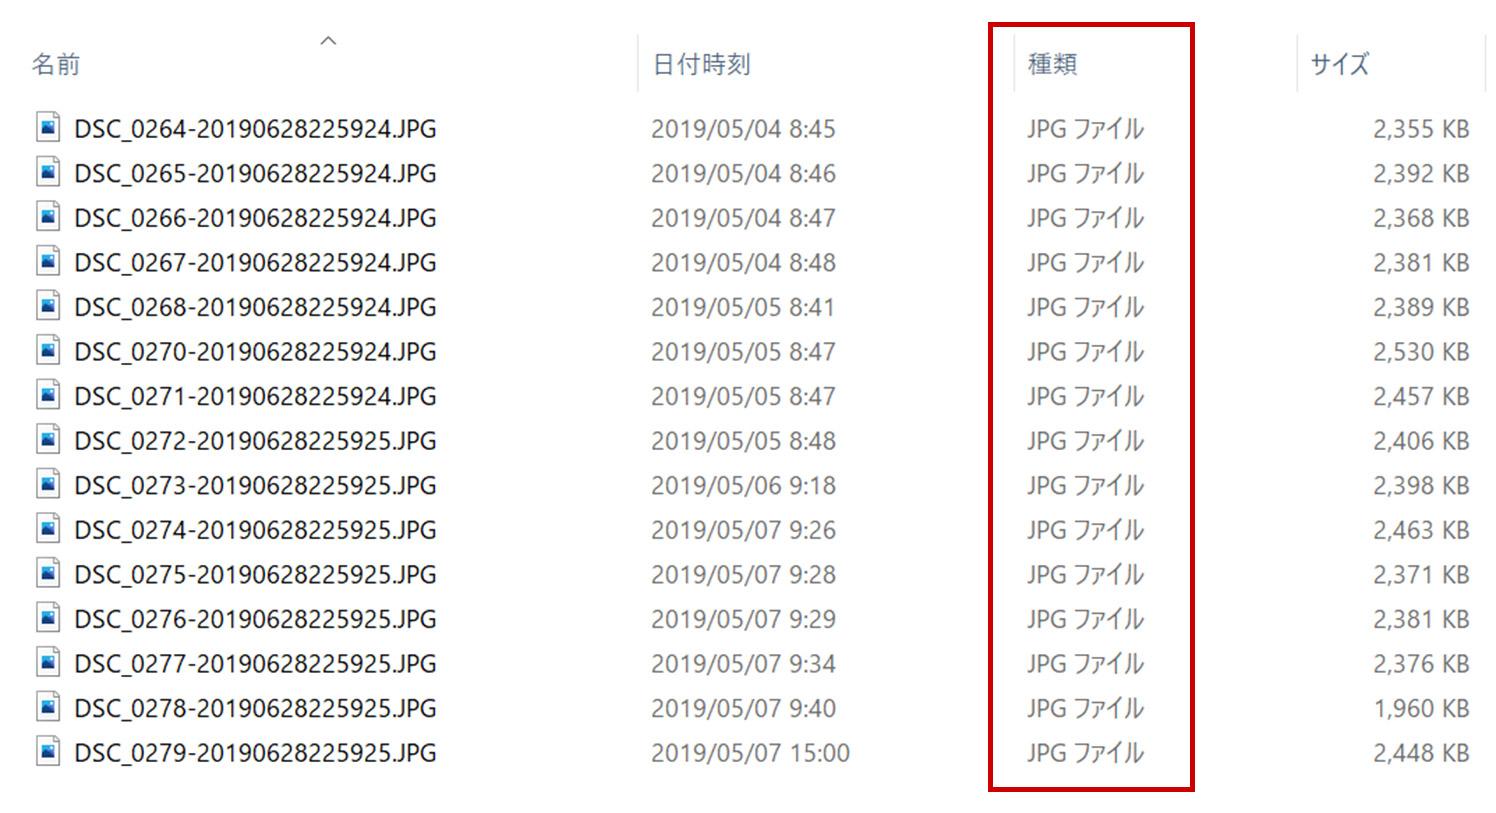 JPEG画像をリスト表示